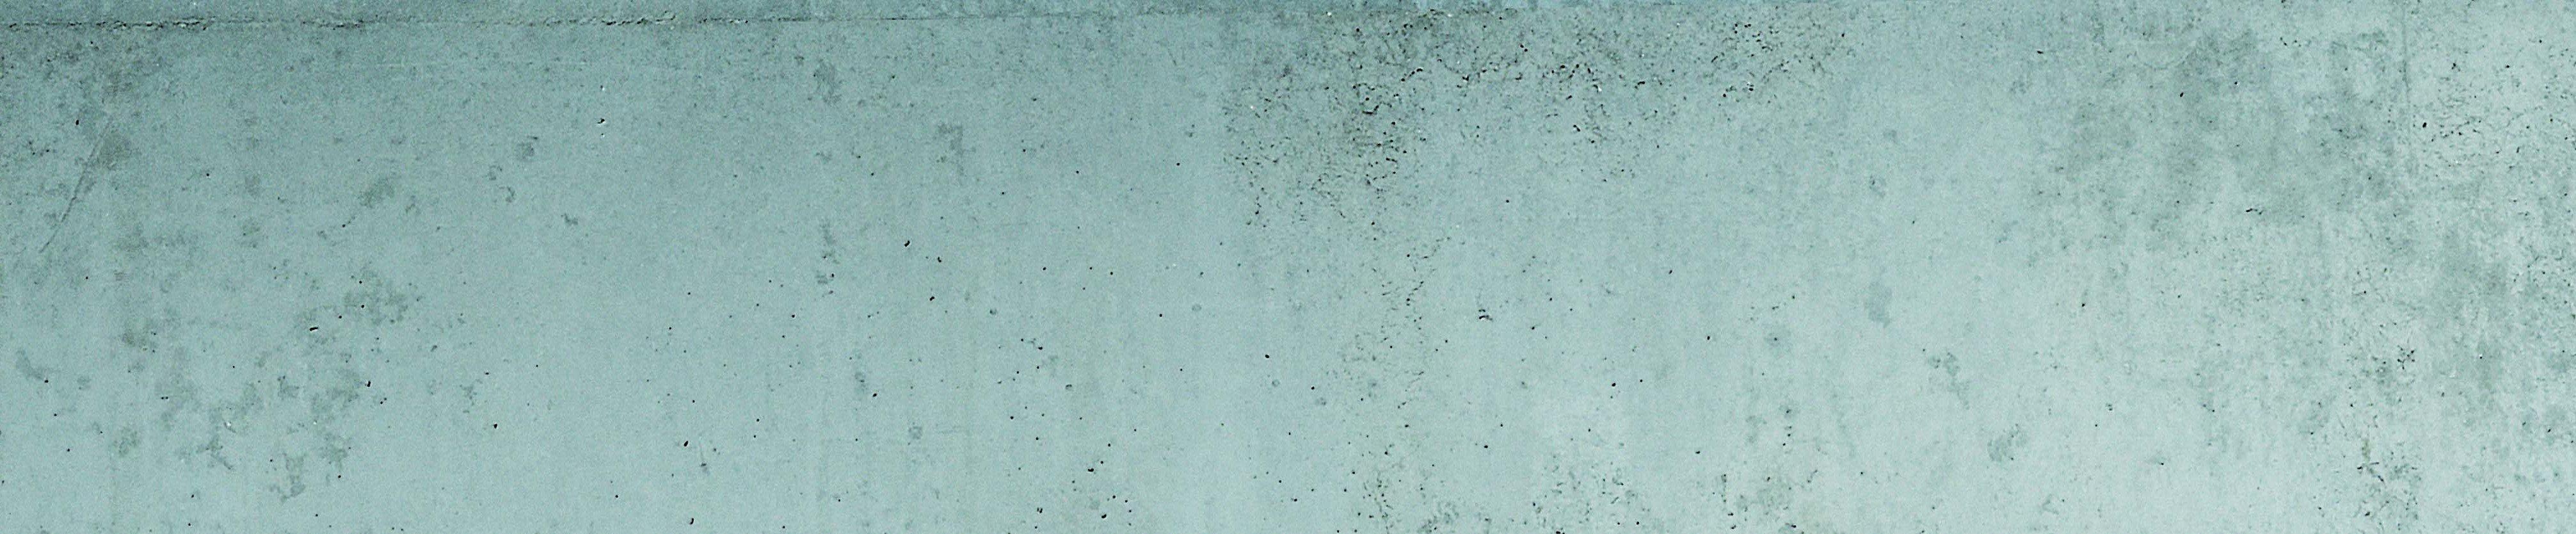 betononderplaat grijs carpgarant